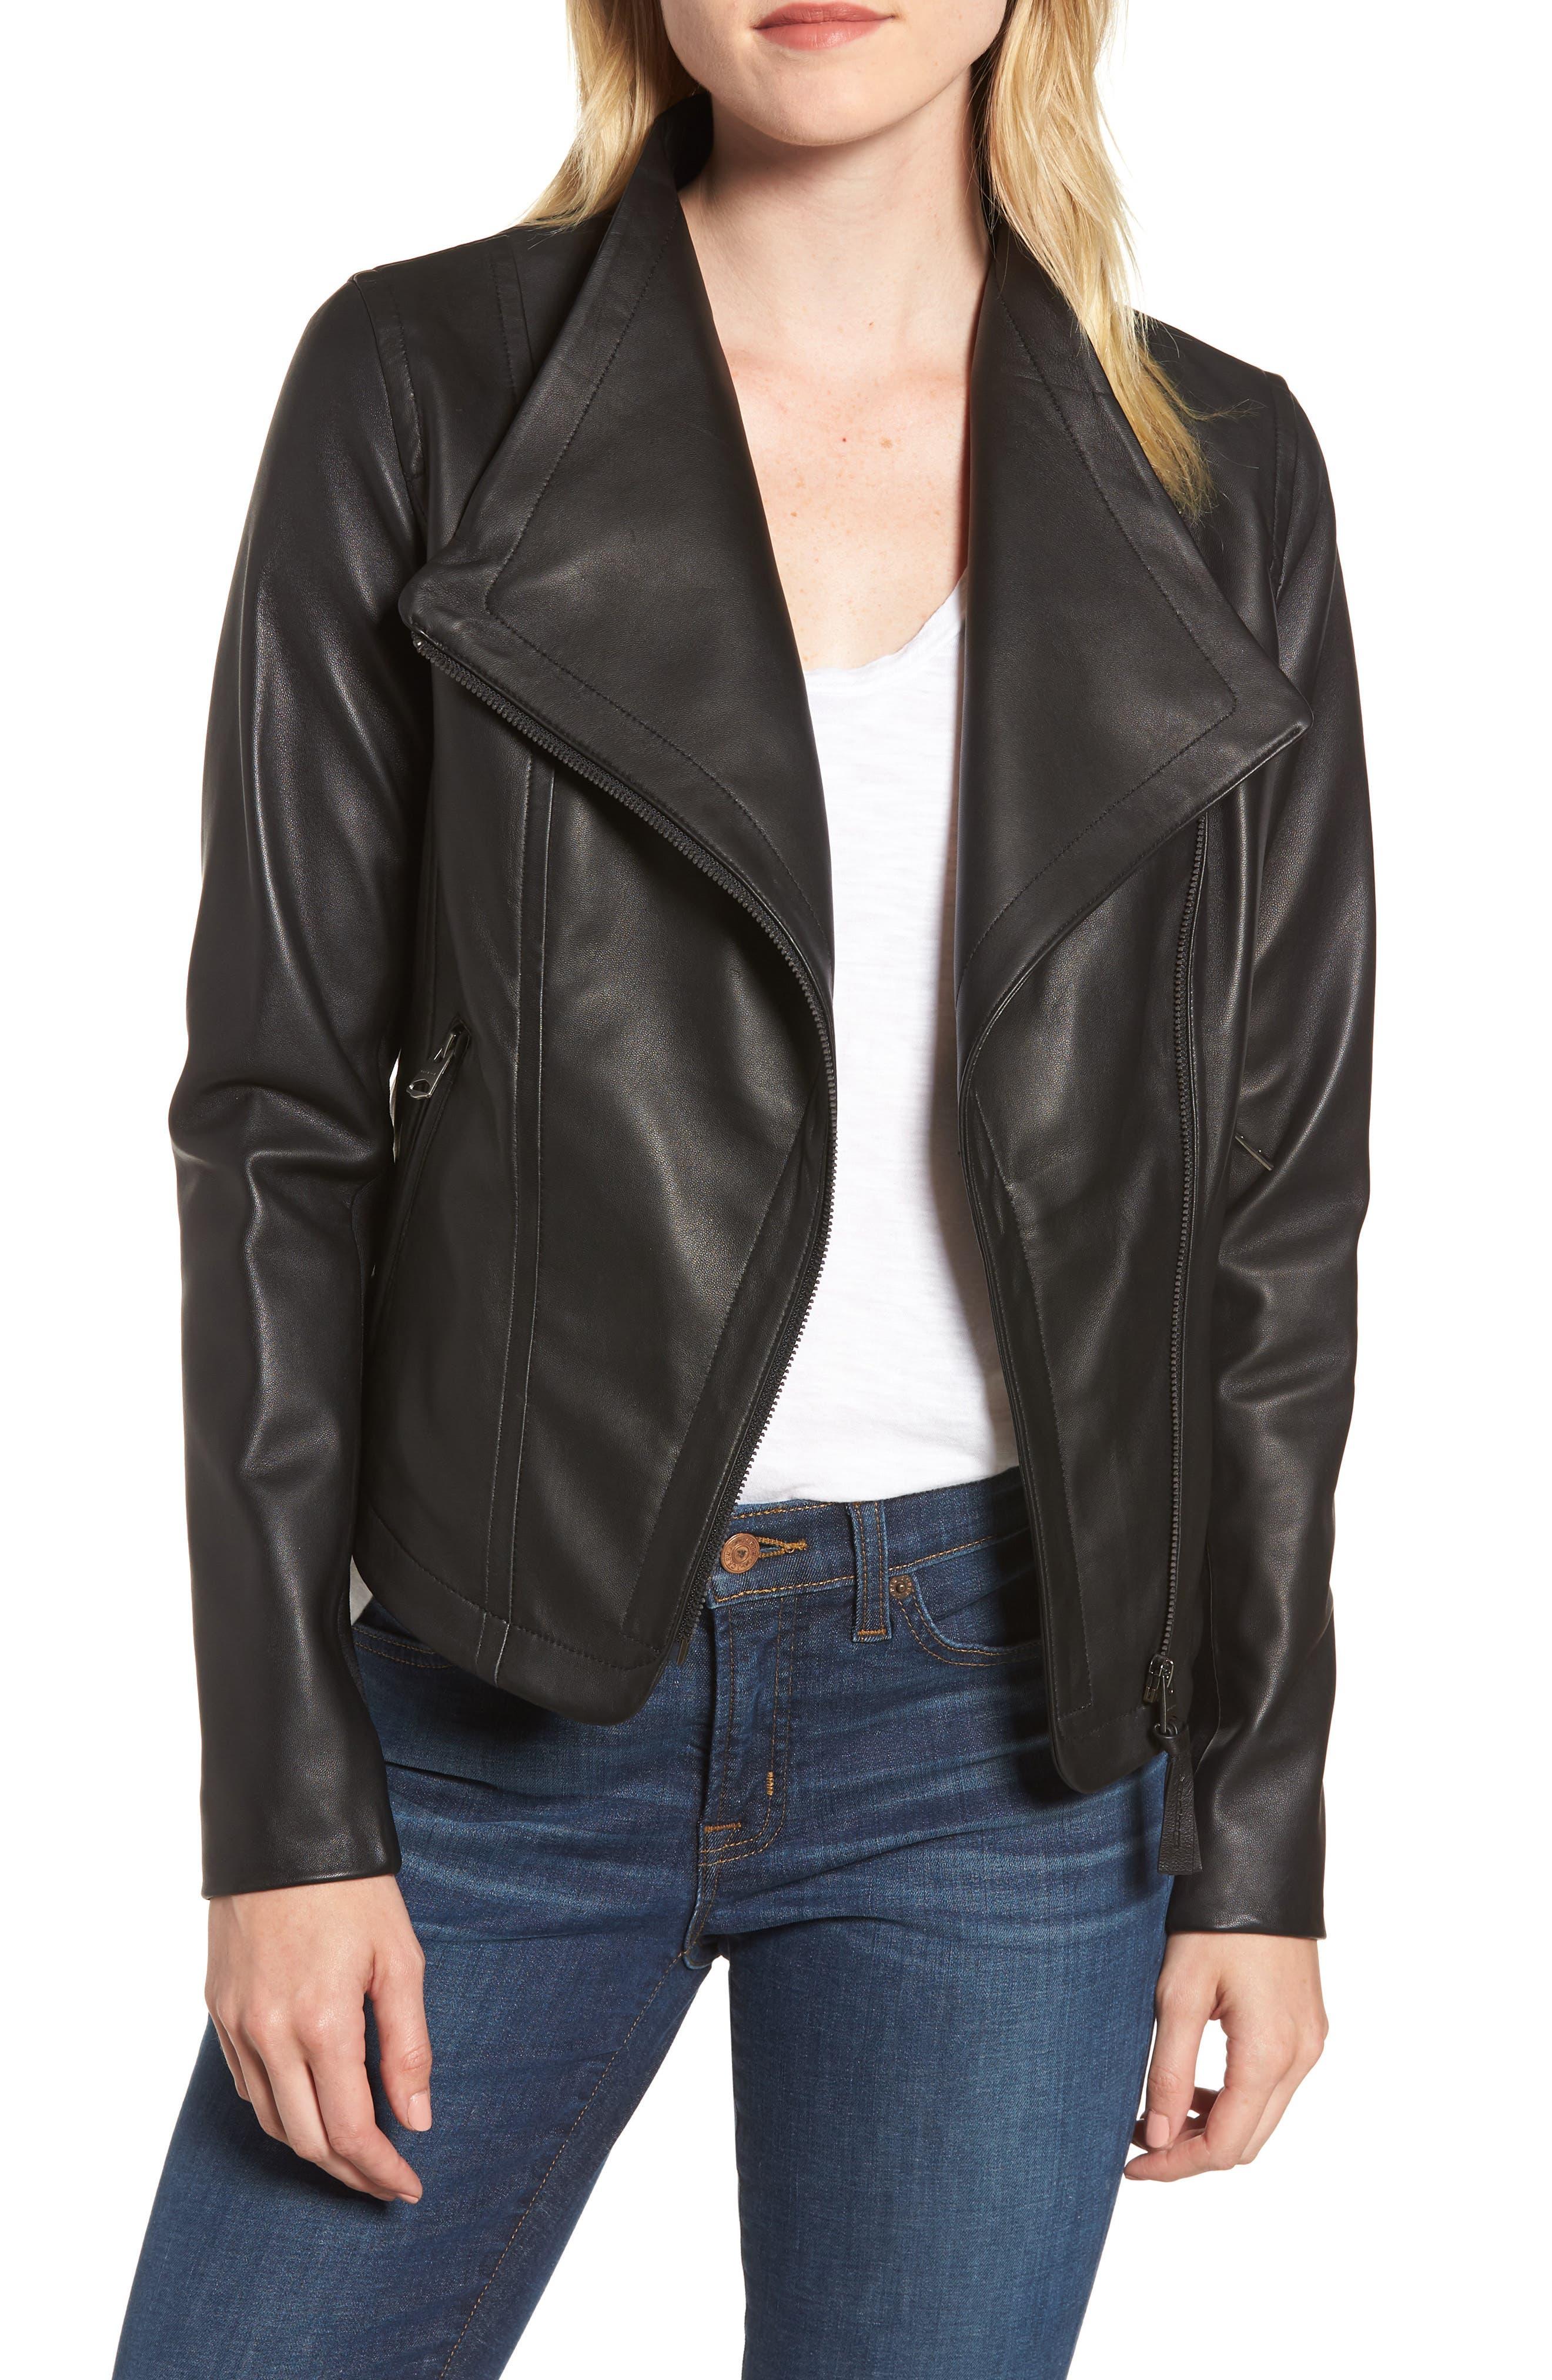 MACKAGE,                             Pina-L Leather Moto Jacket,                             Main thumbnail 1, color,                             001